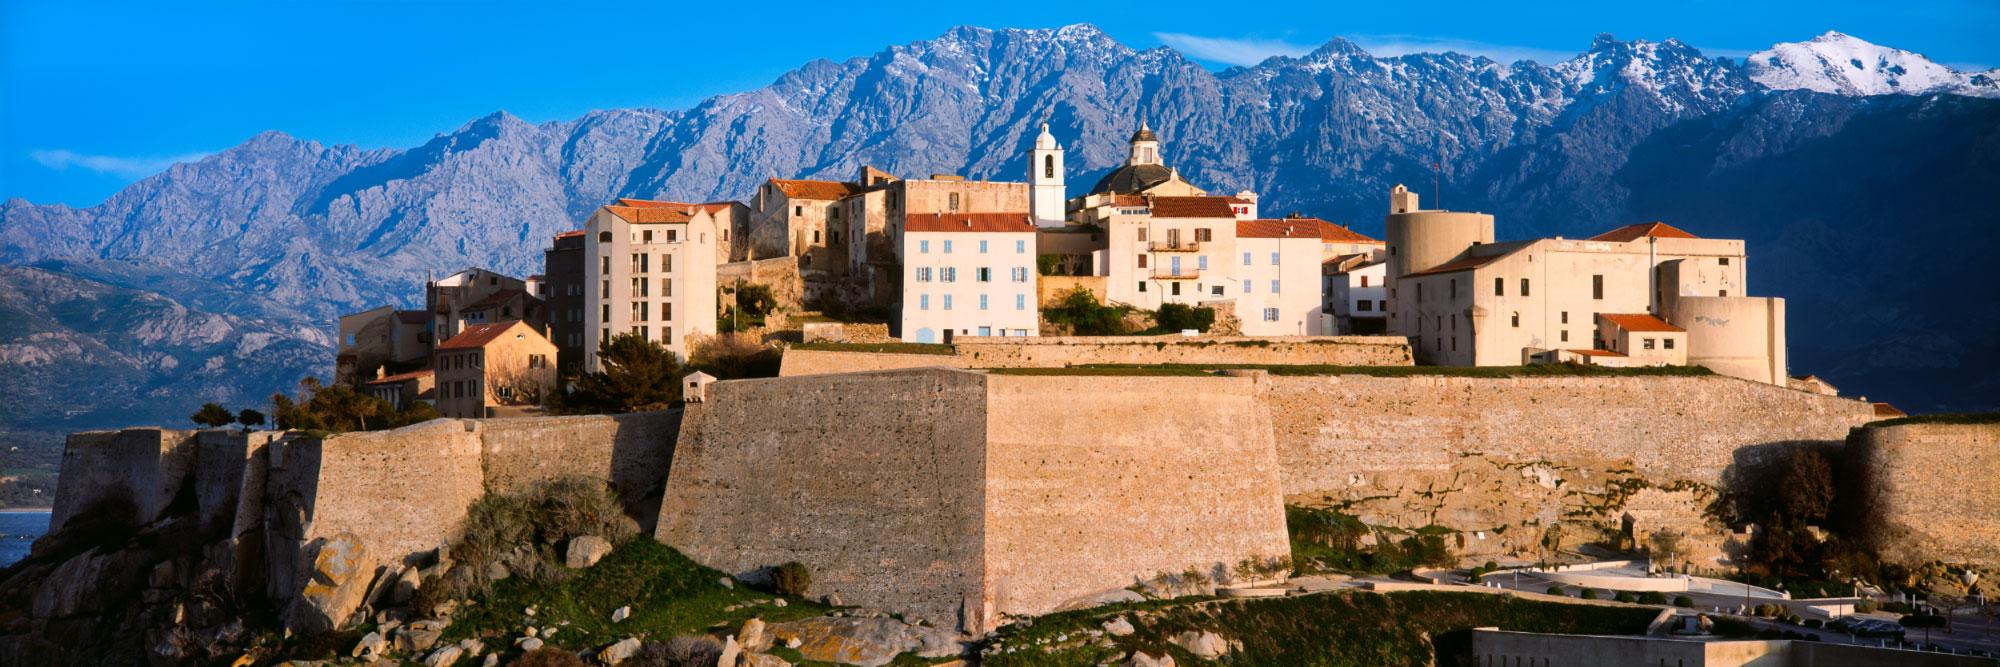 Citadelle de Calvi, Balagne